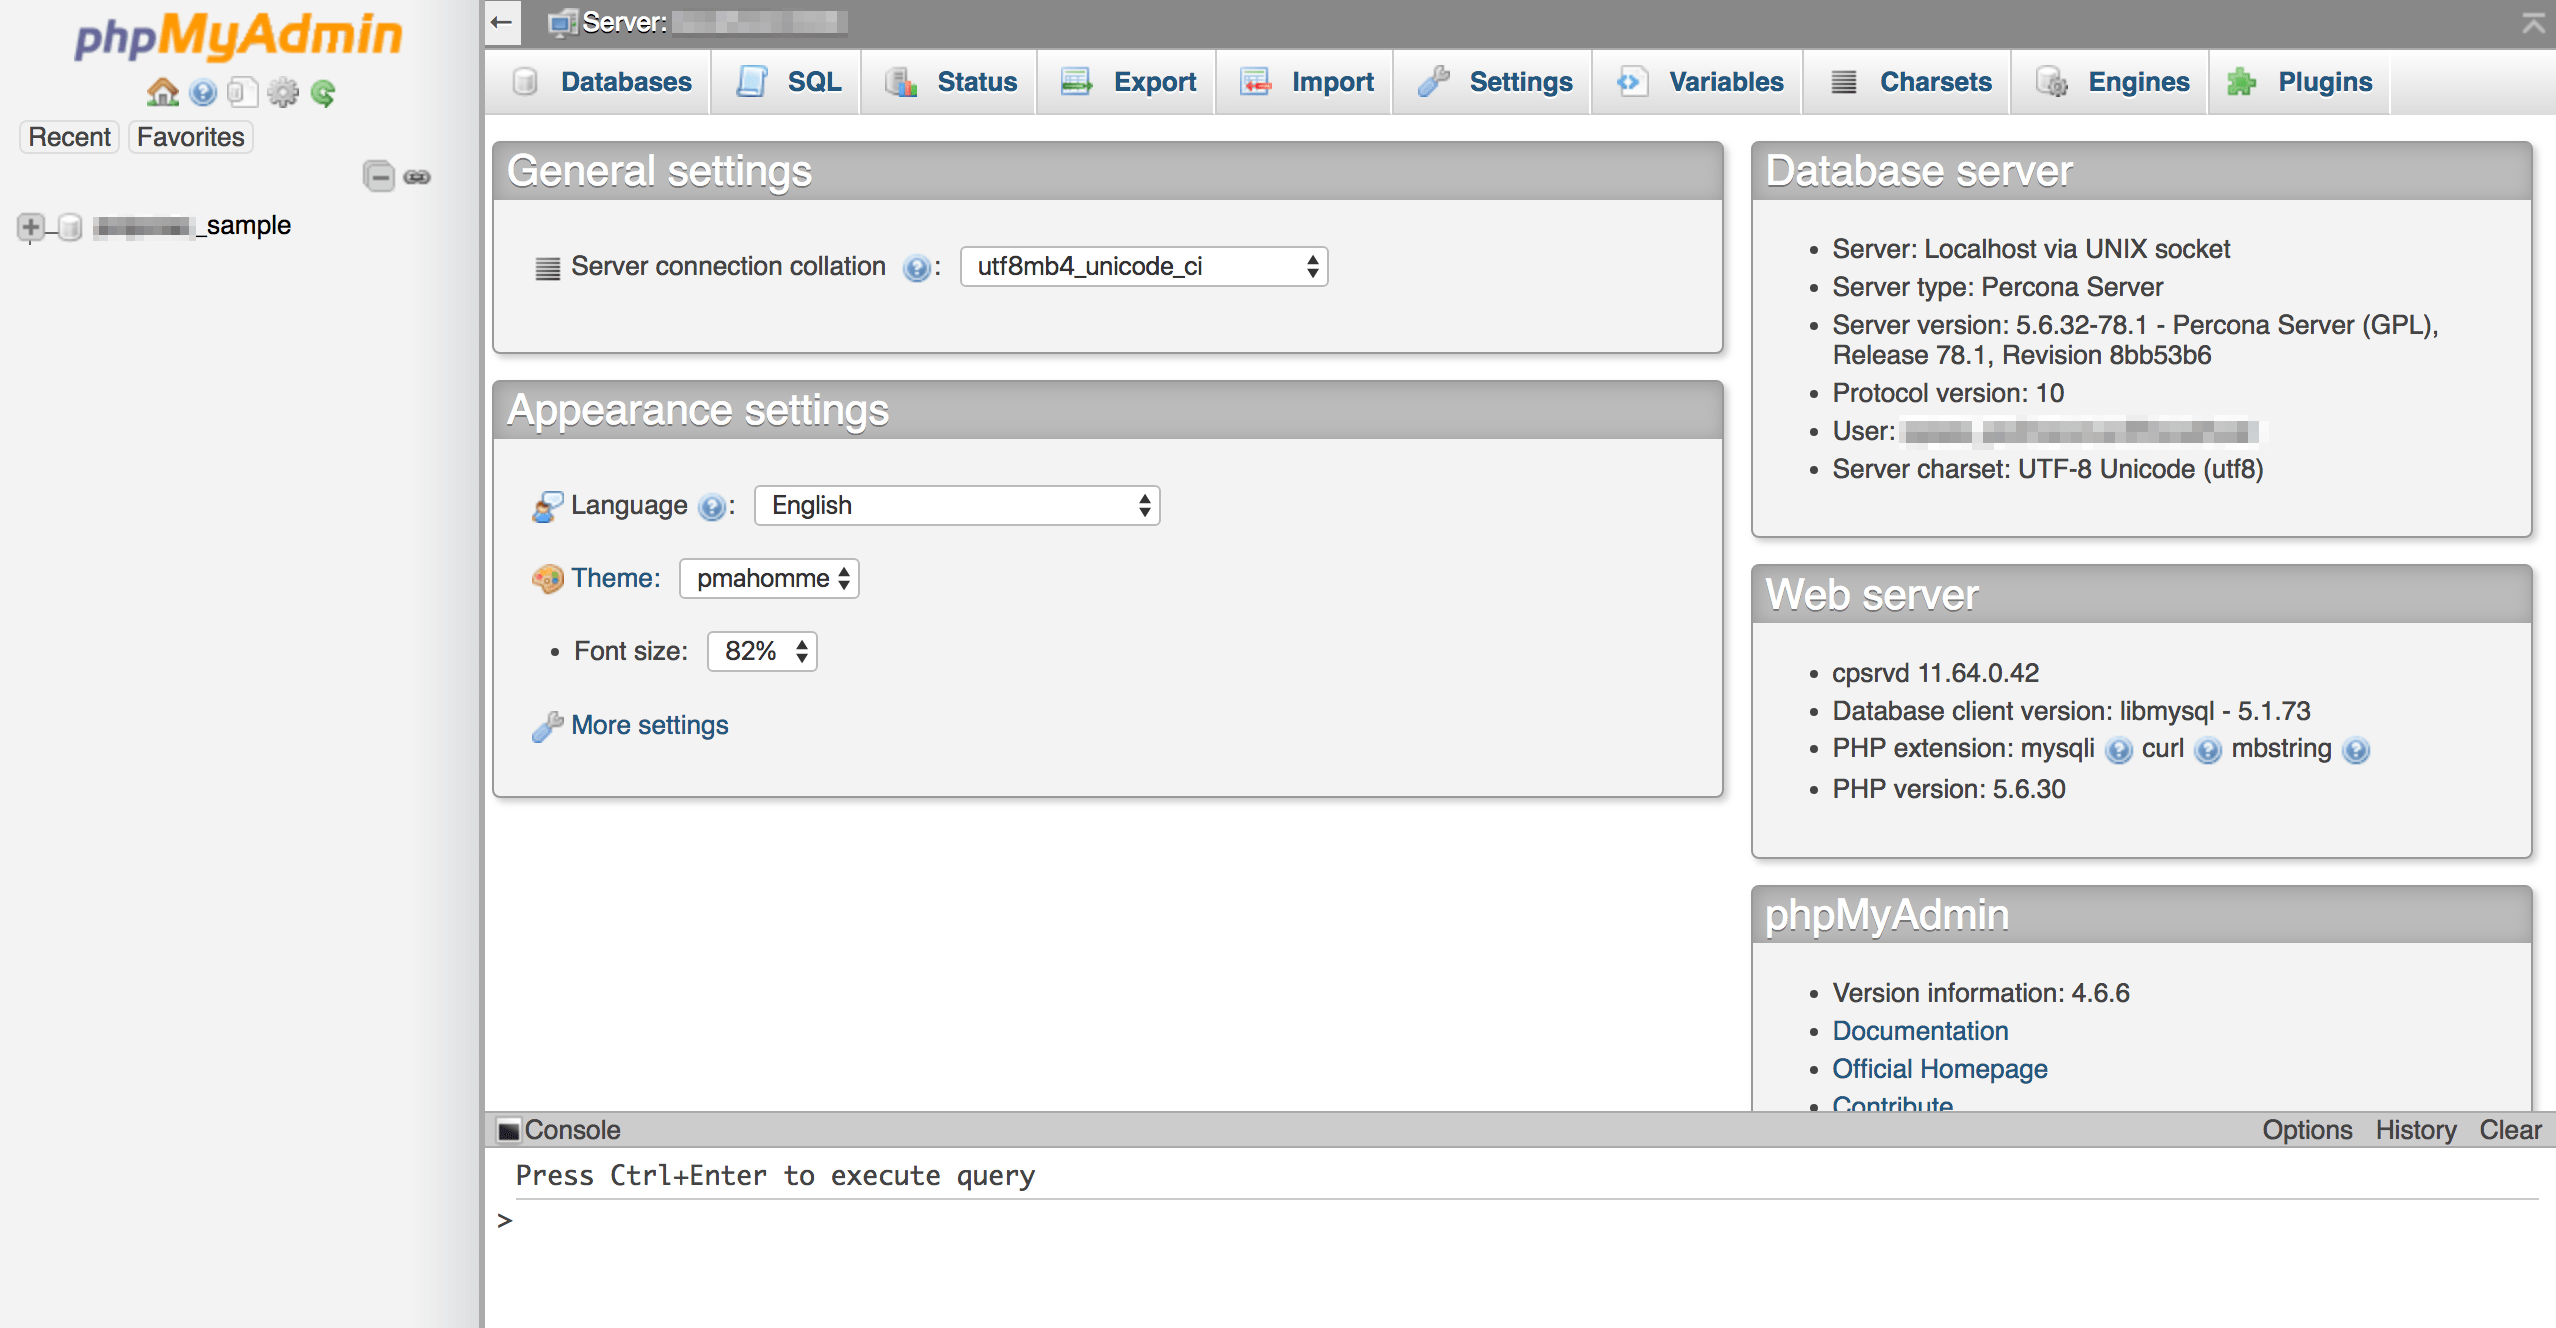 BlueHost's PHP MyAdmin panel. Image via WhoIsHostingThis